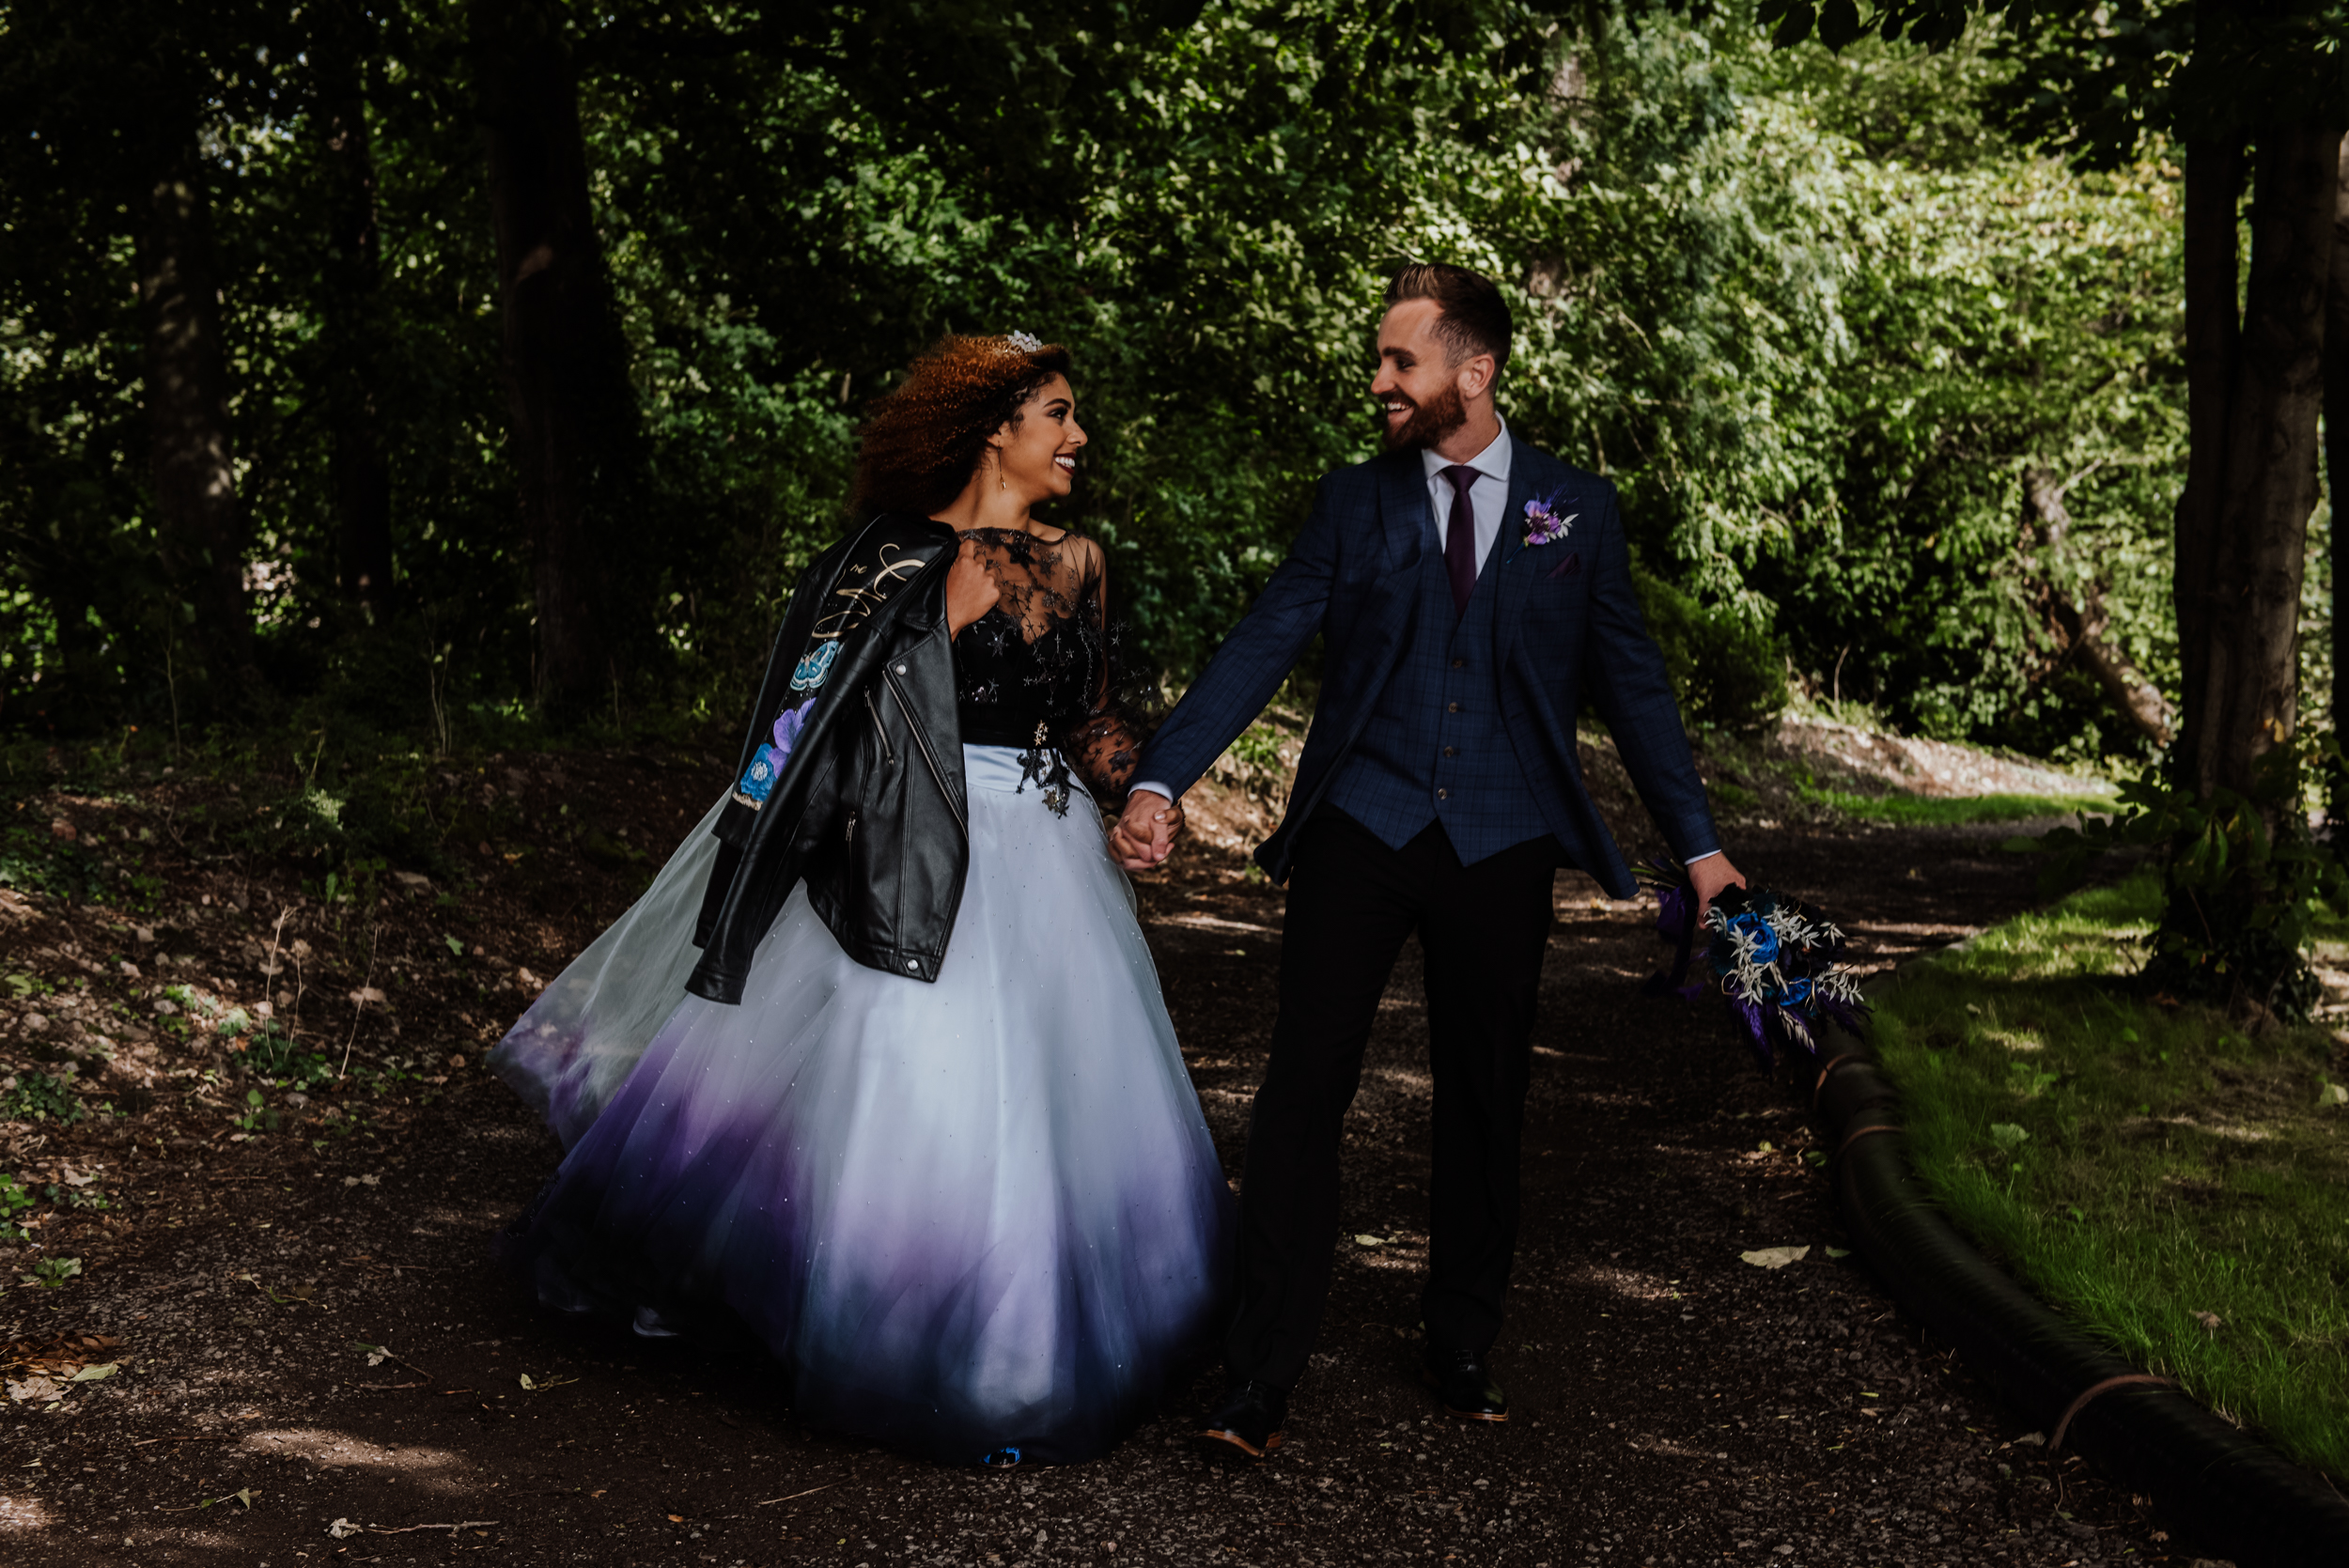 alternative wedding wear - ombre wedding dress & bridal leather jacket - dip dye wedding dress